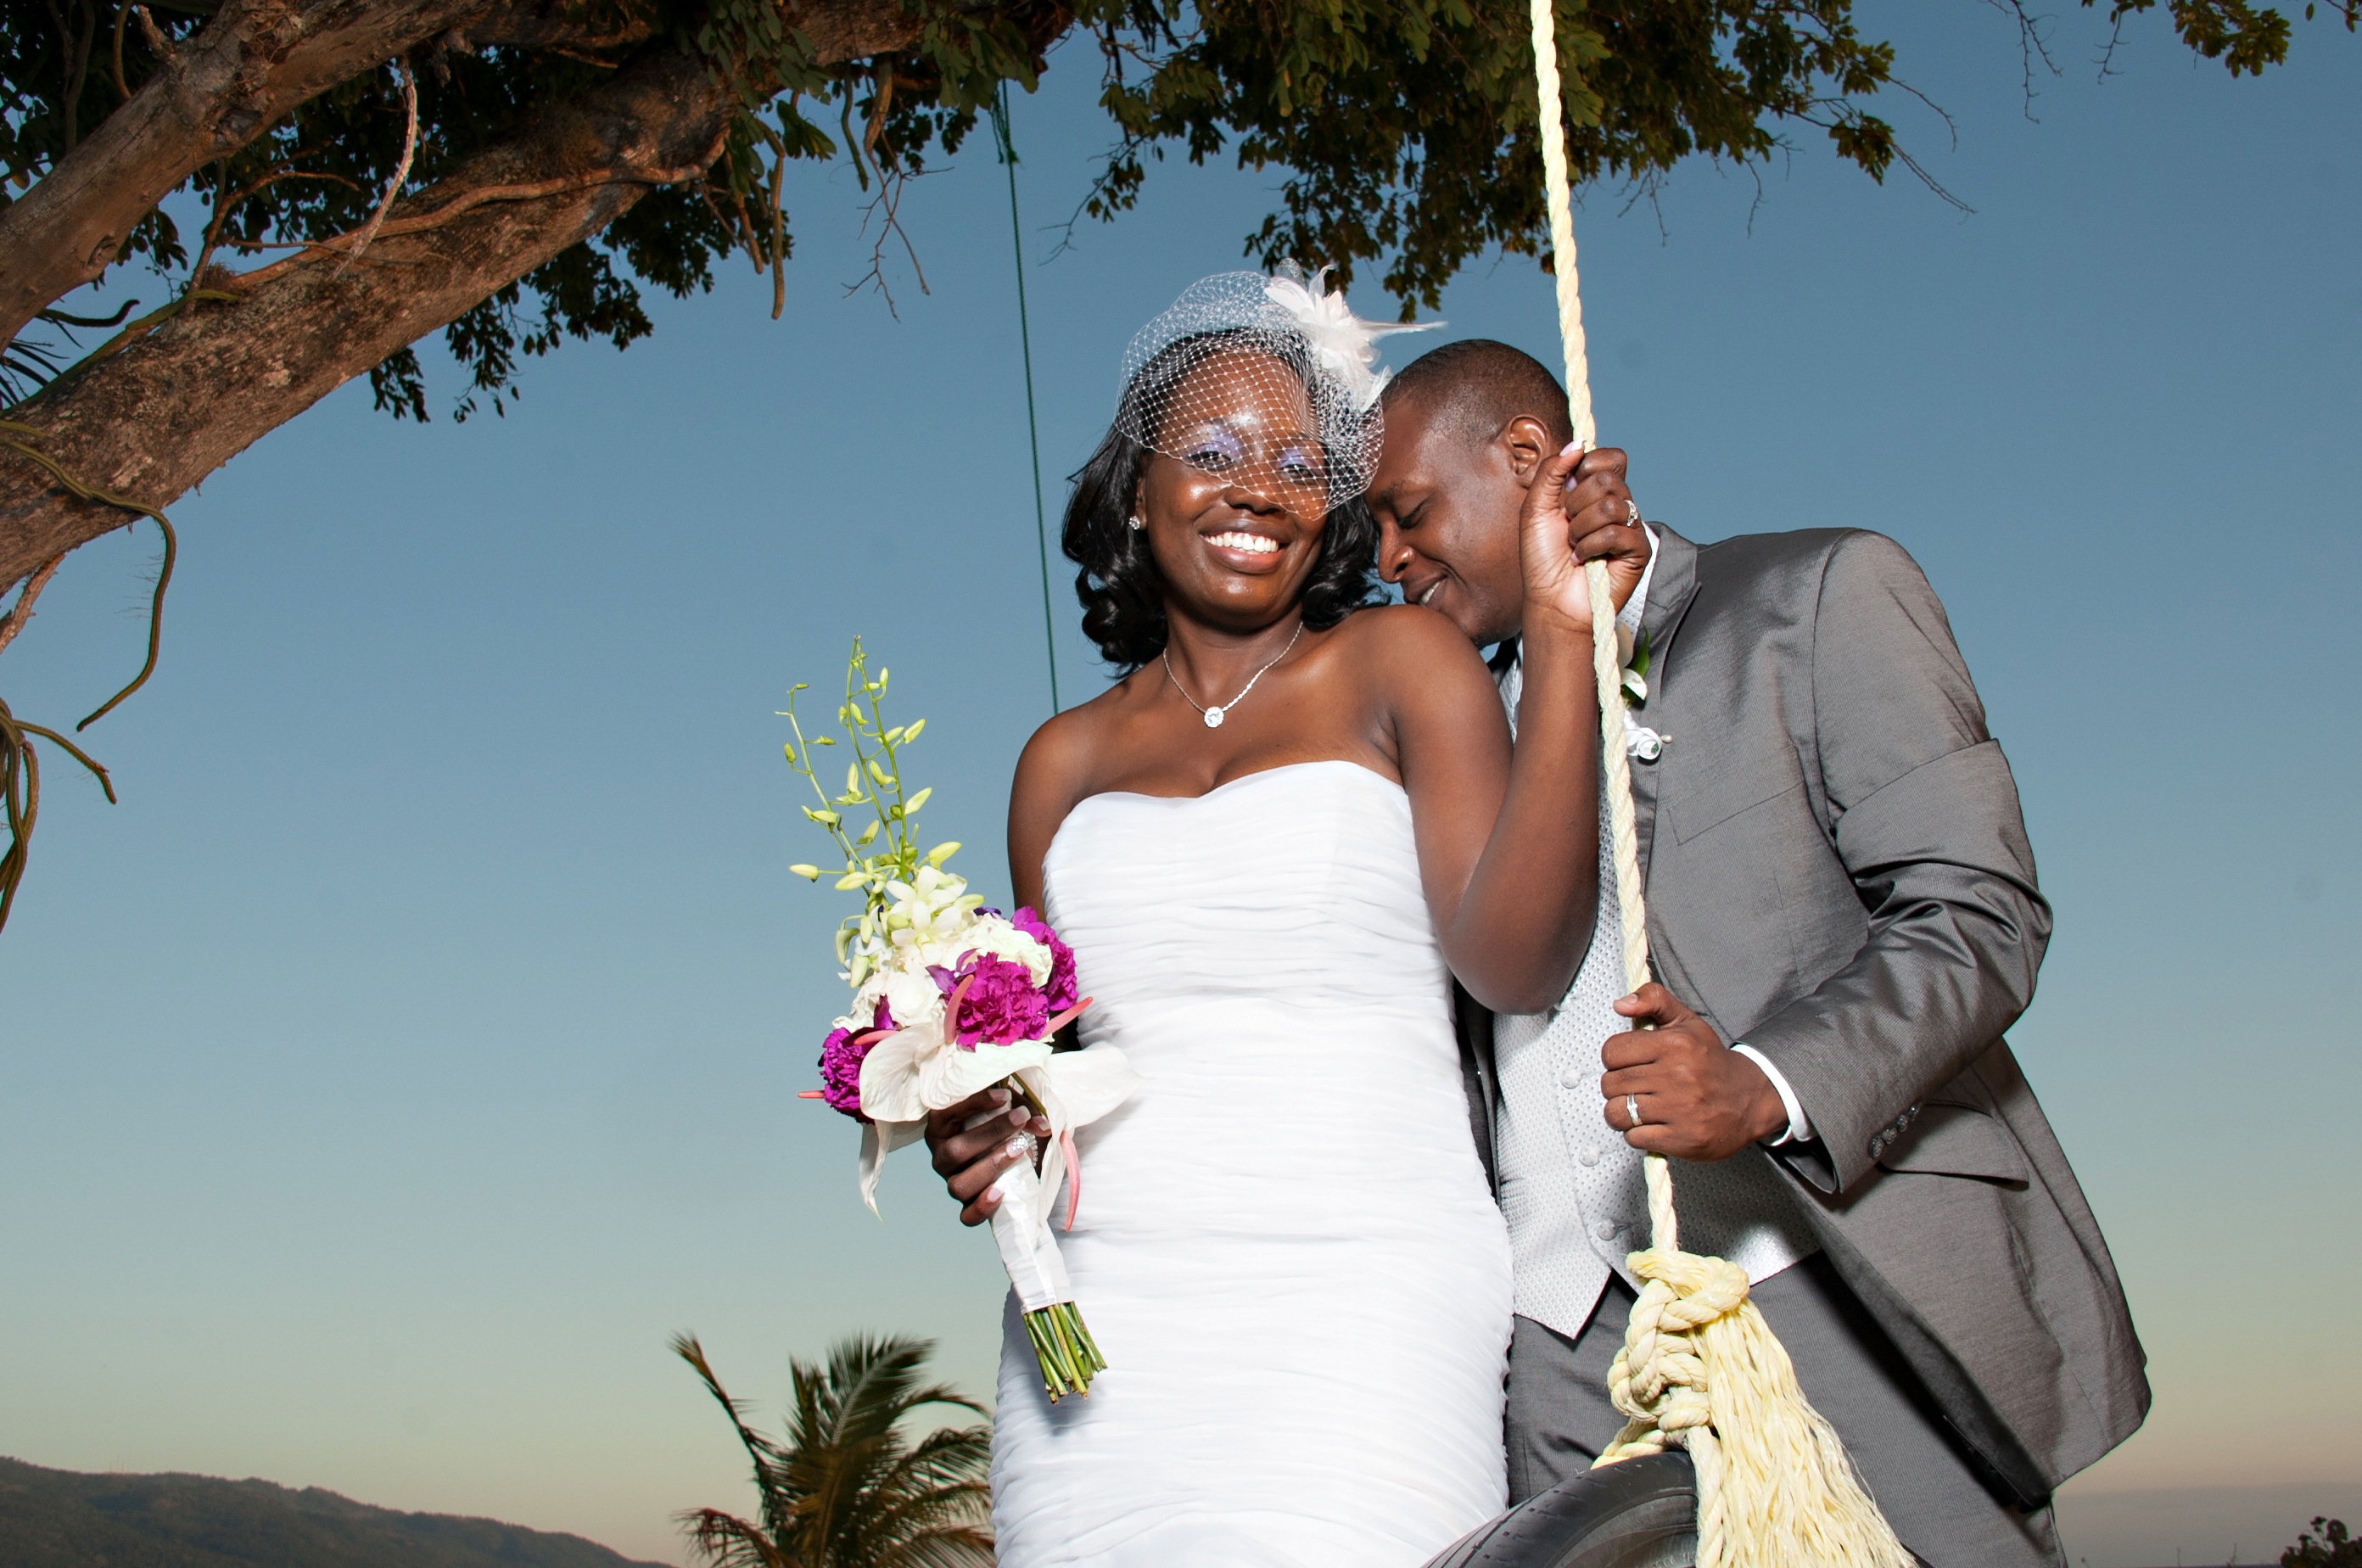 jamaica wedding photographers – Jamaica Wedding Photographers ...